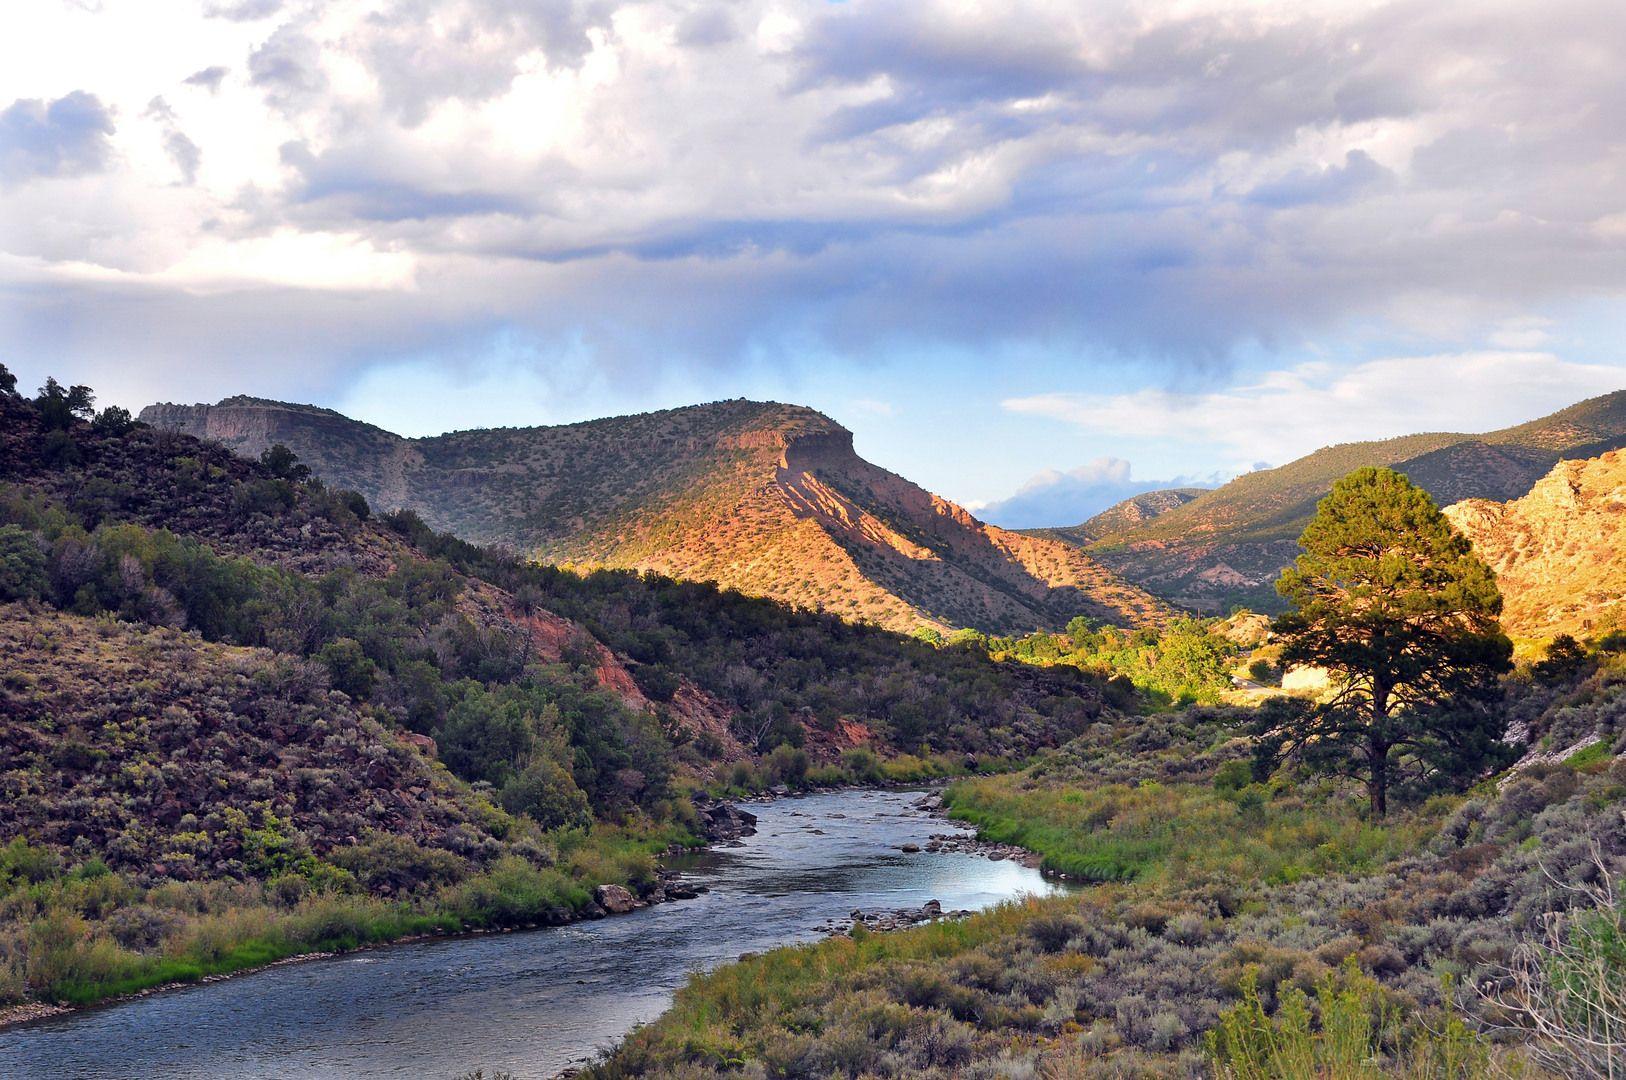 rio grande, new mexico   Rio Grande by Richard Susanto in New Mexico on Fotopedia - Images for ...